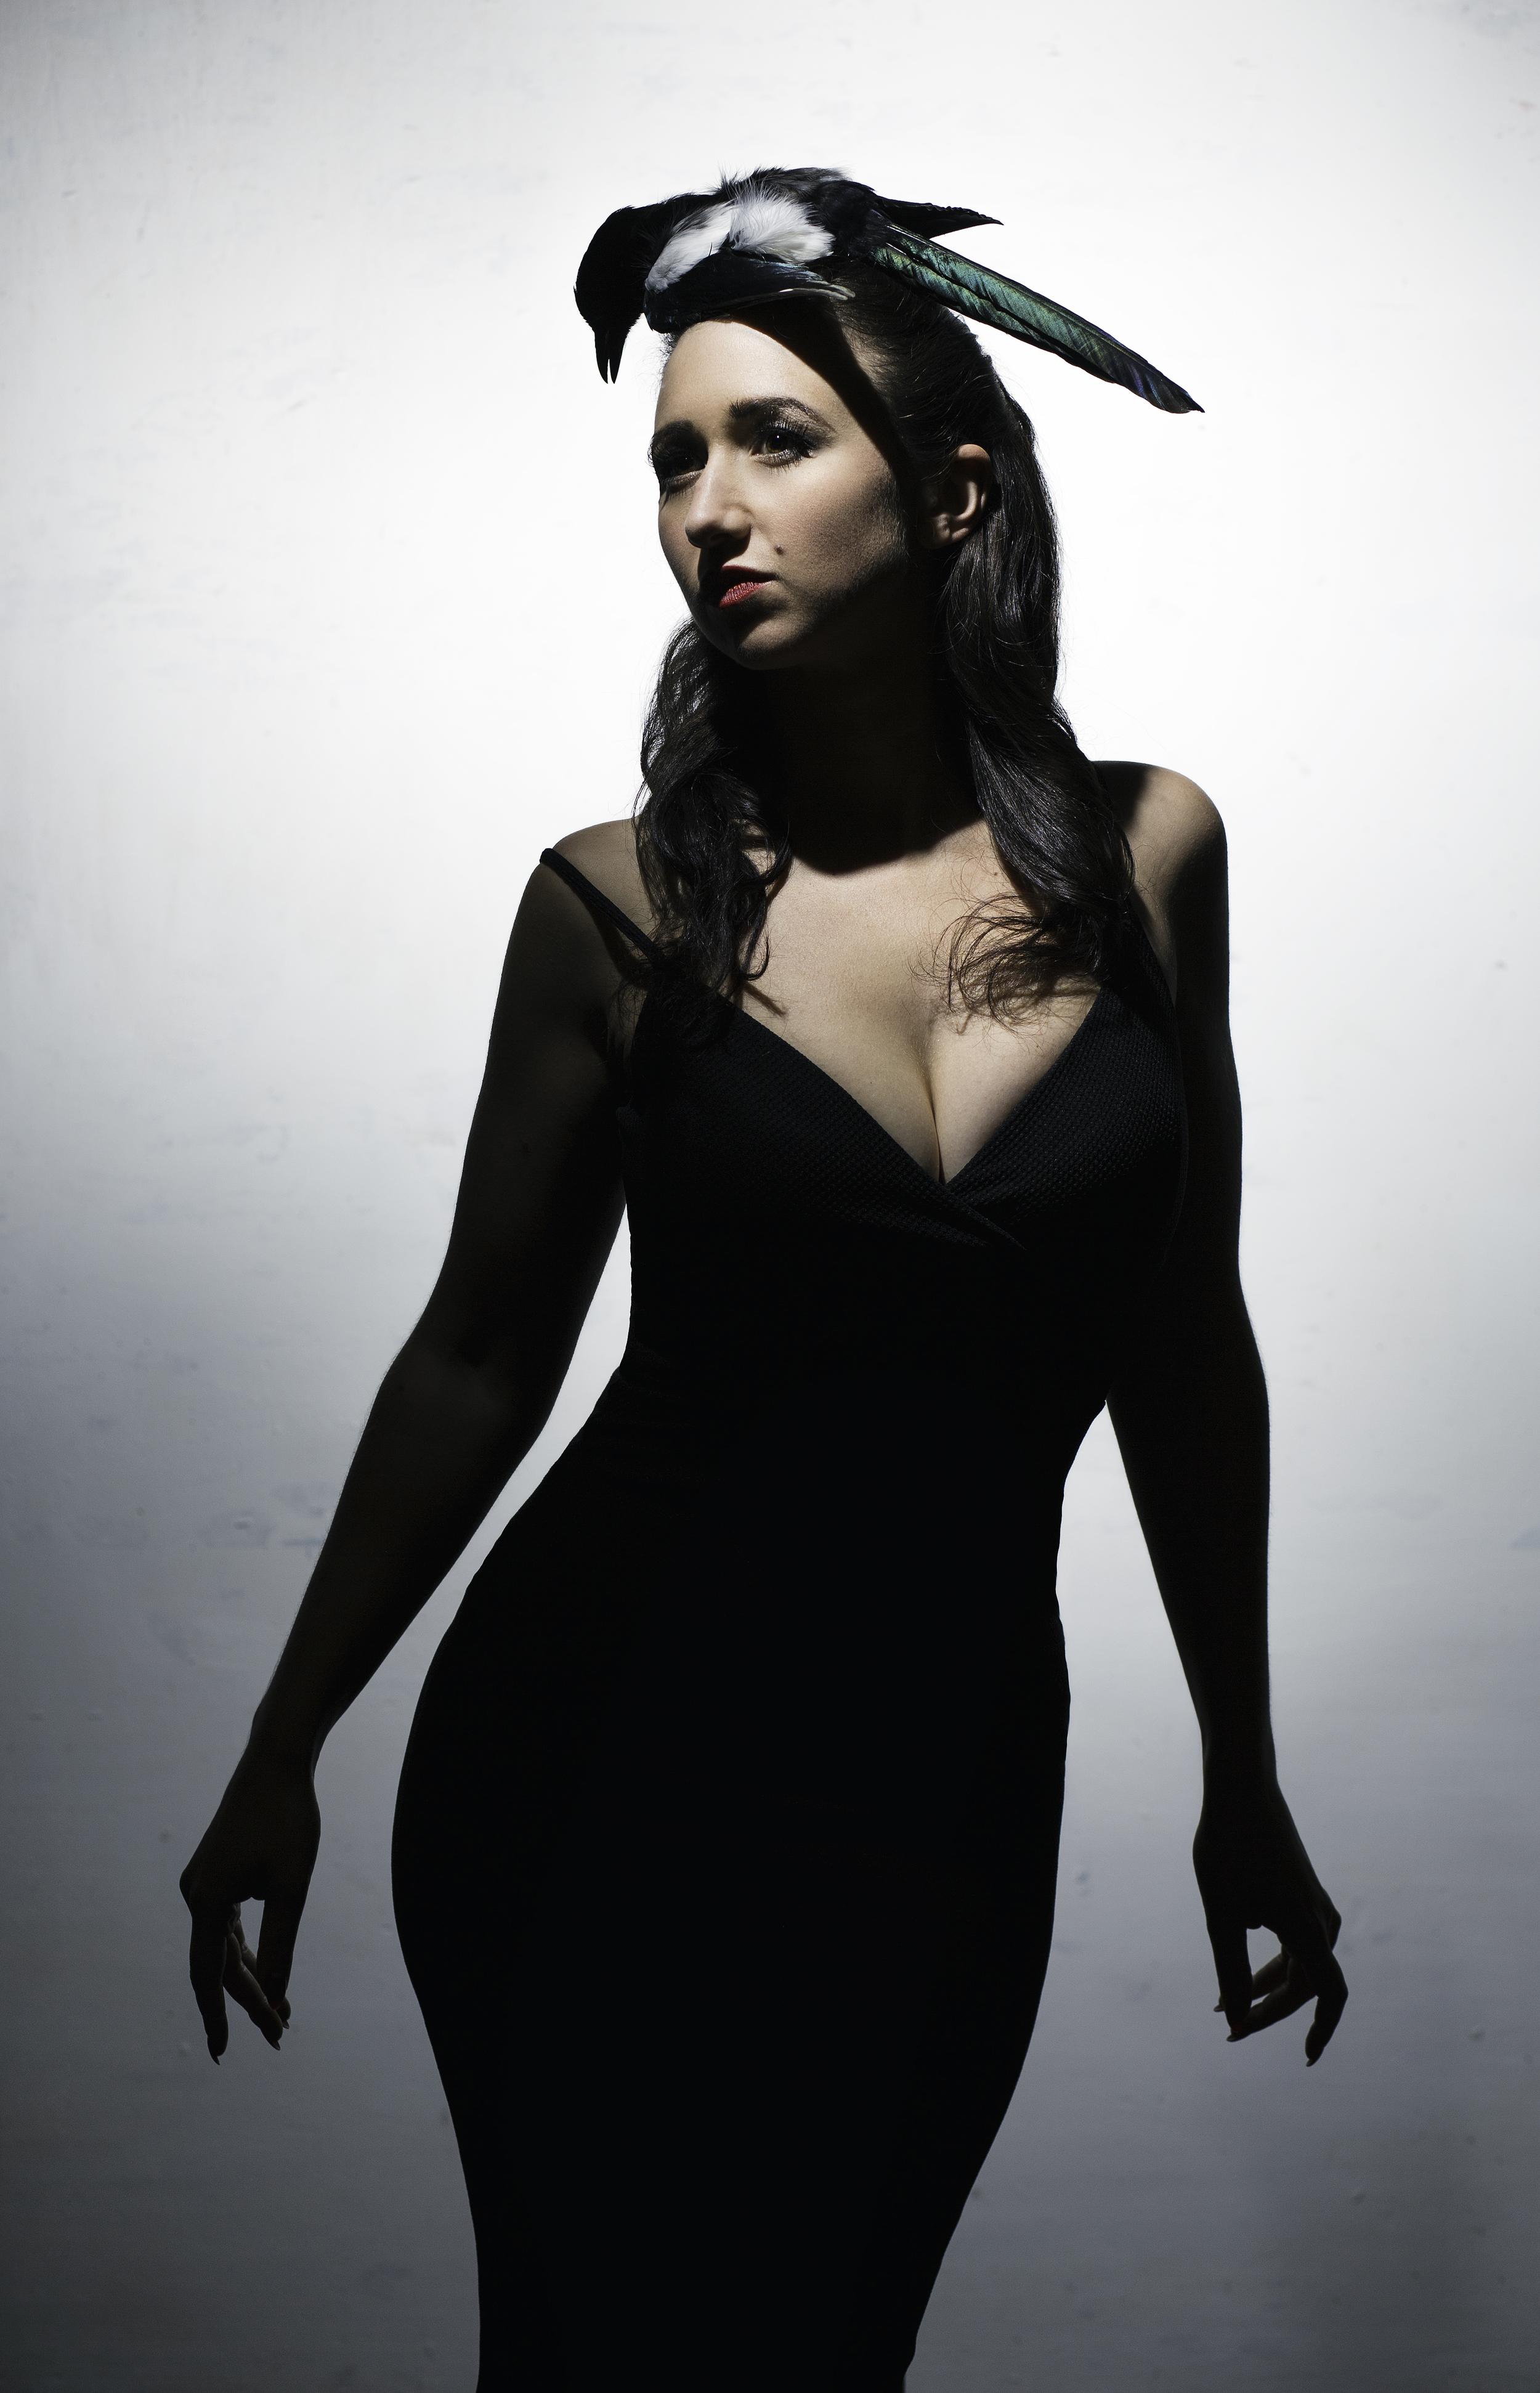 silhouette magpie.jpg